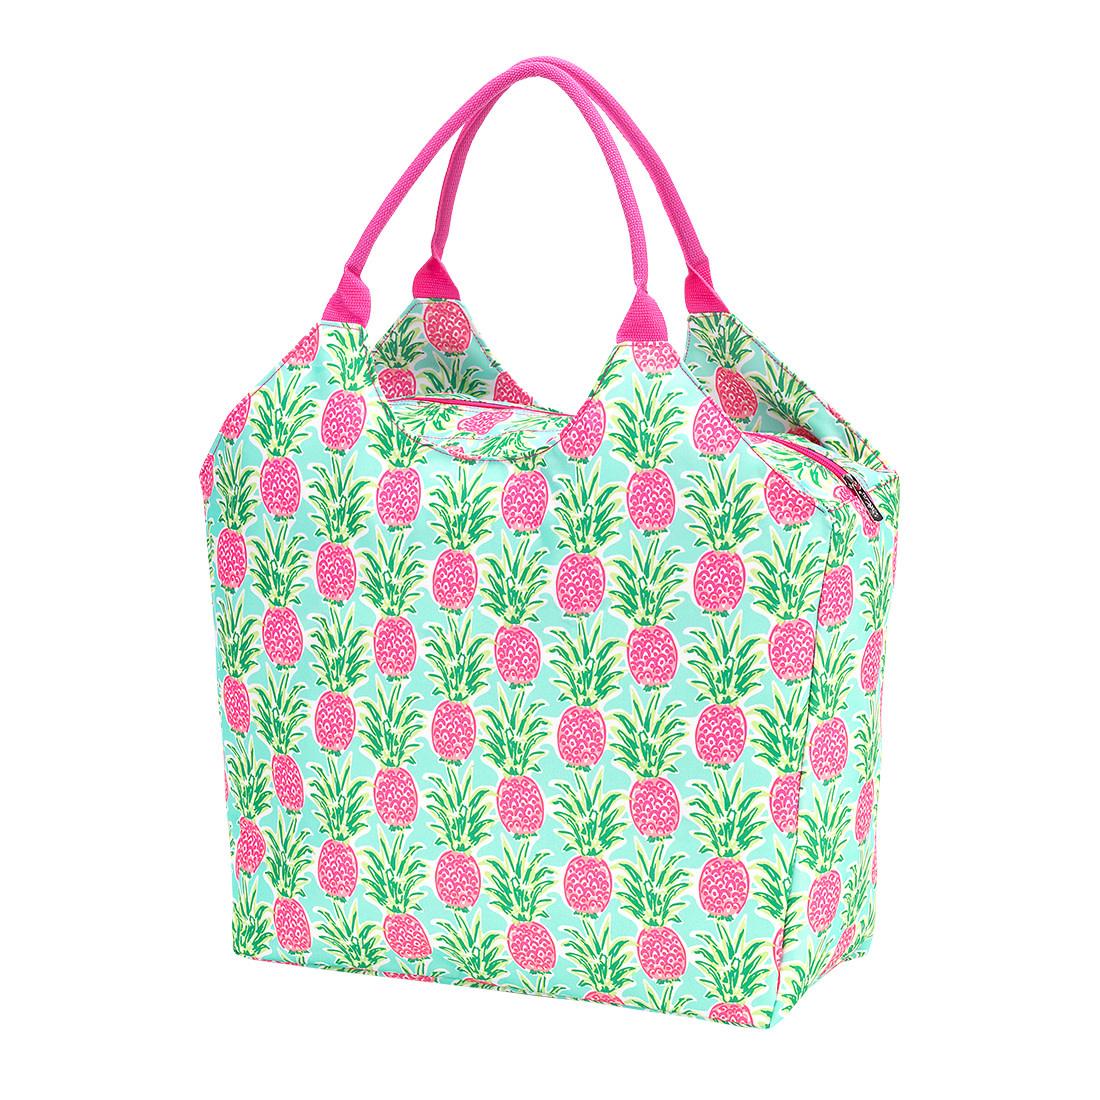 SALE  Monogrammed Flamingo Print Tote Bag